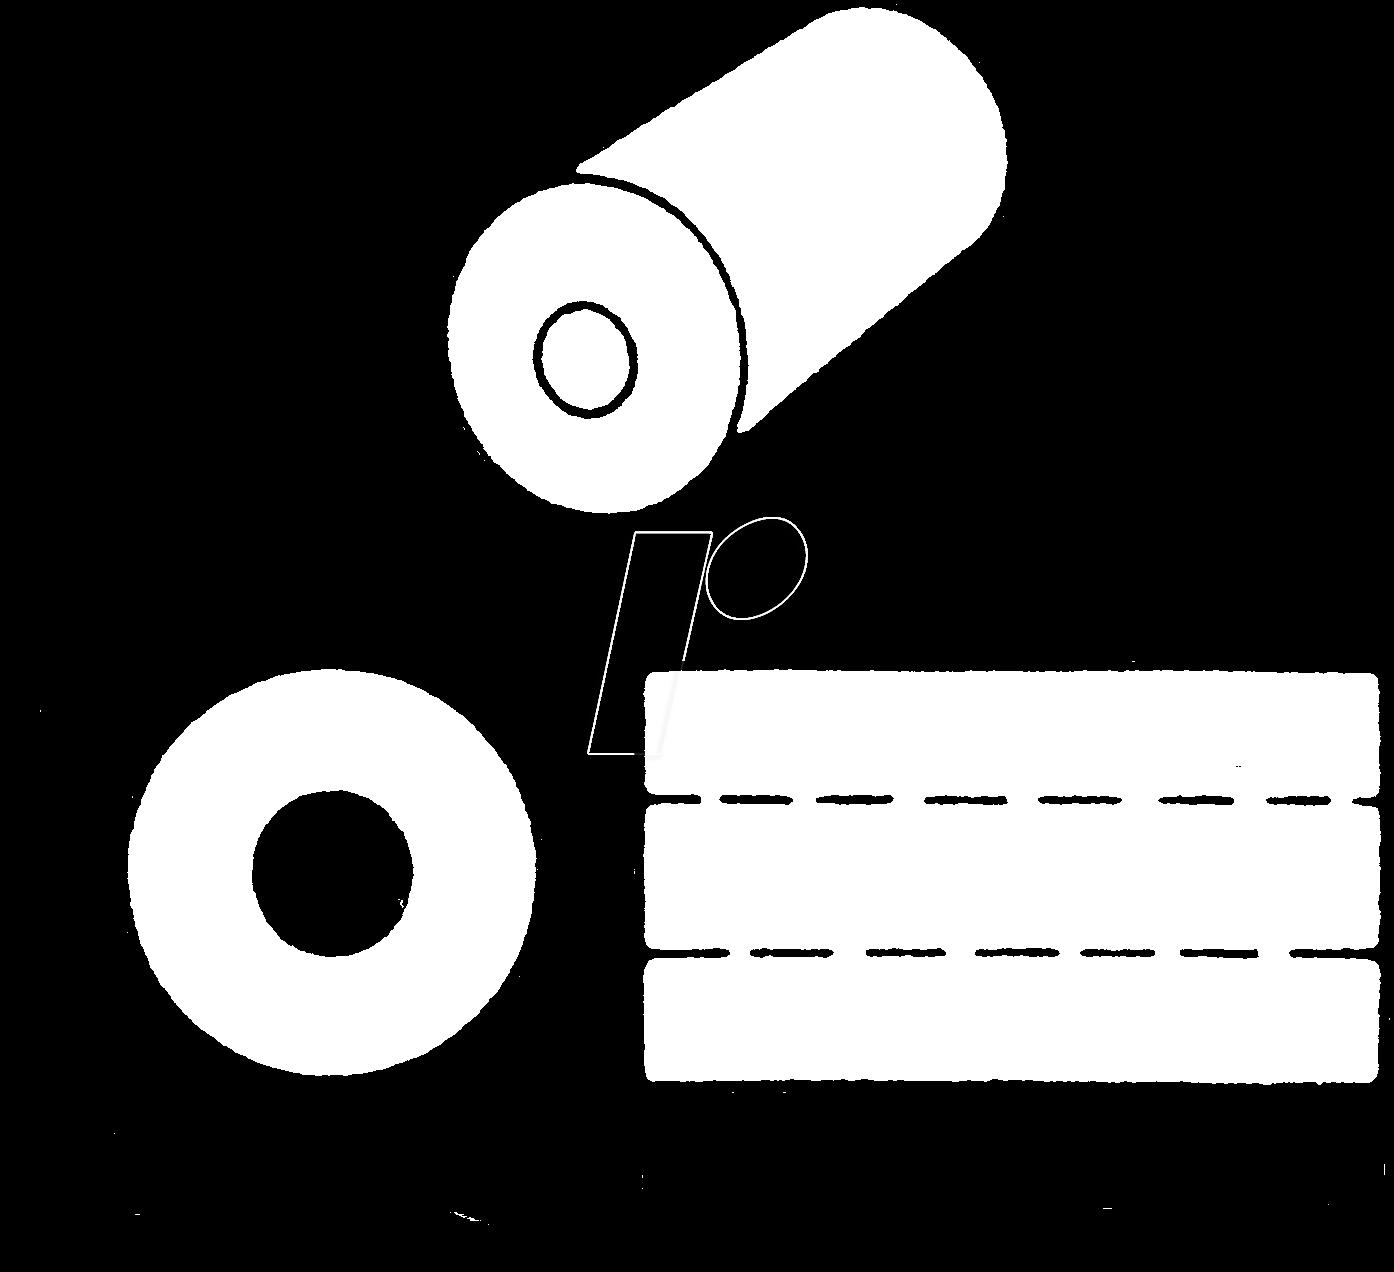 AMI FB-73-2401 - Ferritkern für Ø 5 mm, 3,13 µH, Material: 73